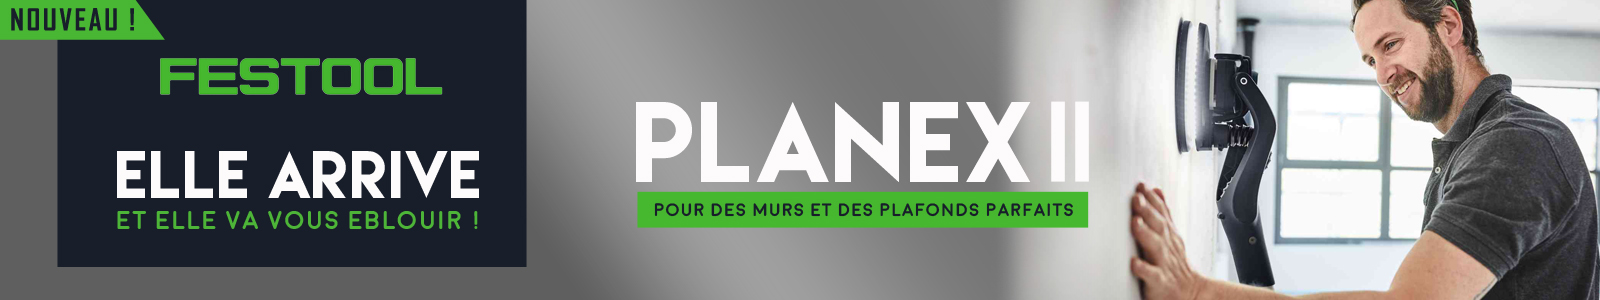 Planex II Festool